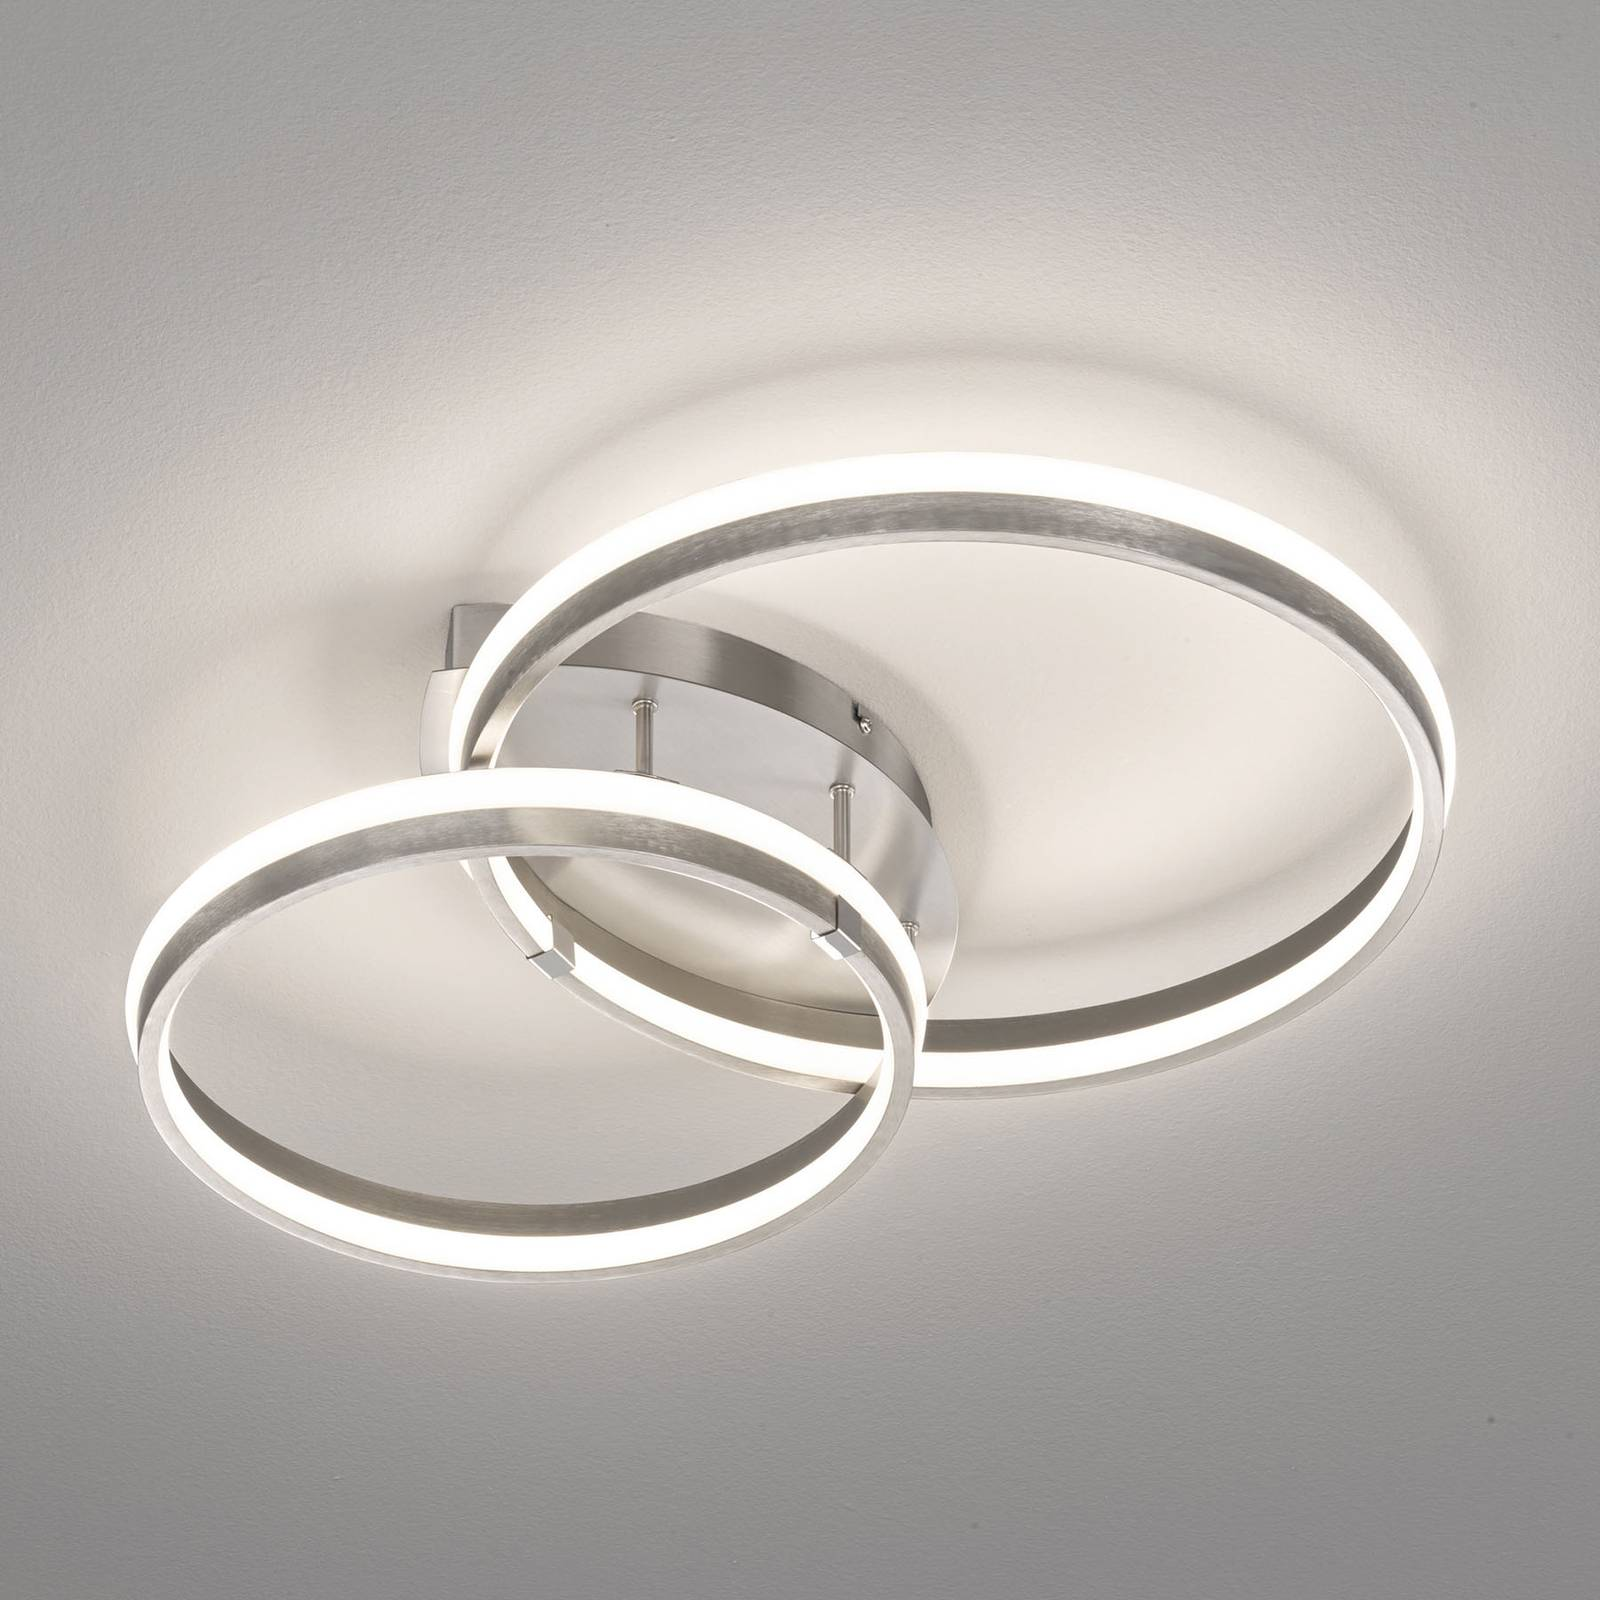 Lampa sufitowa LED Nomade, ściemniana kolory niklu